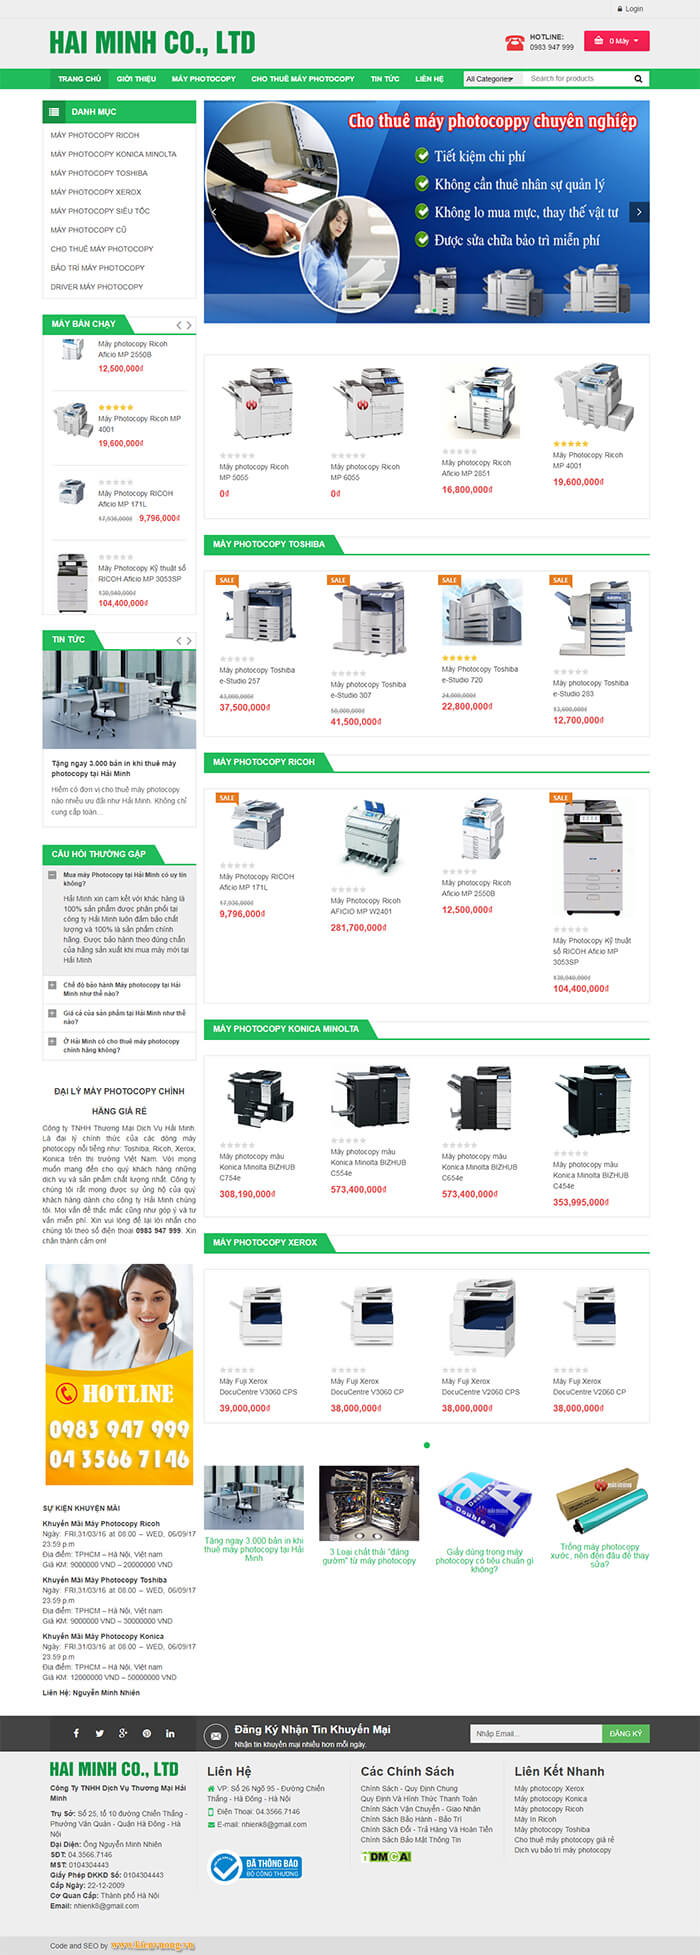 Dịch vụ thiết kế website máy in máy photocopy